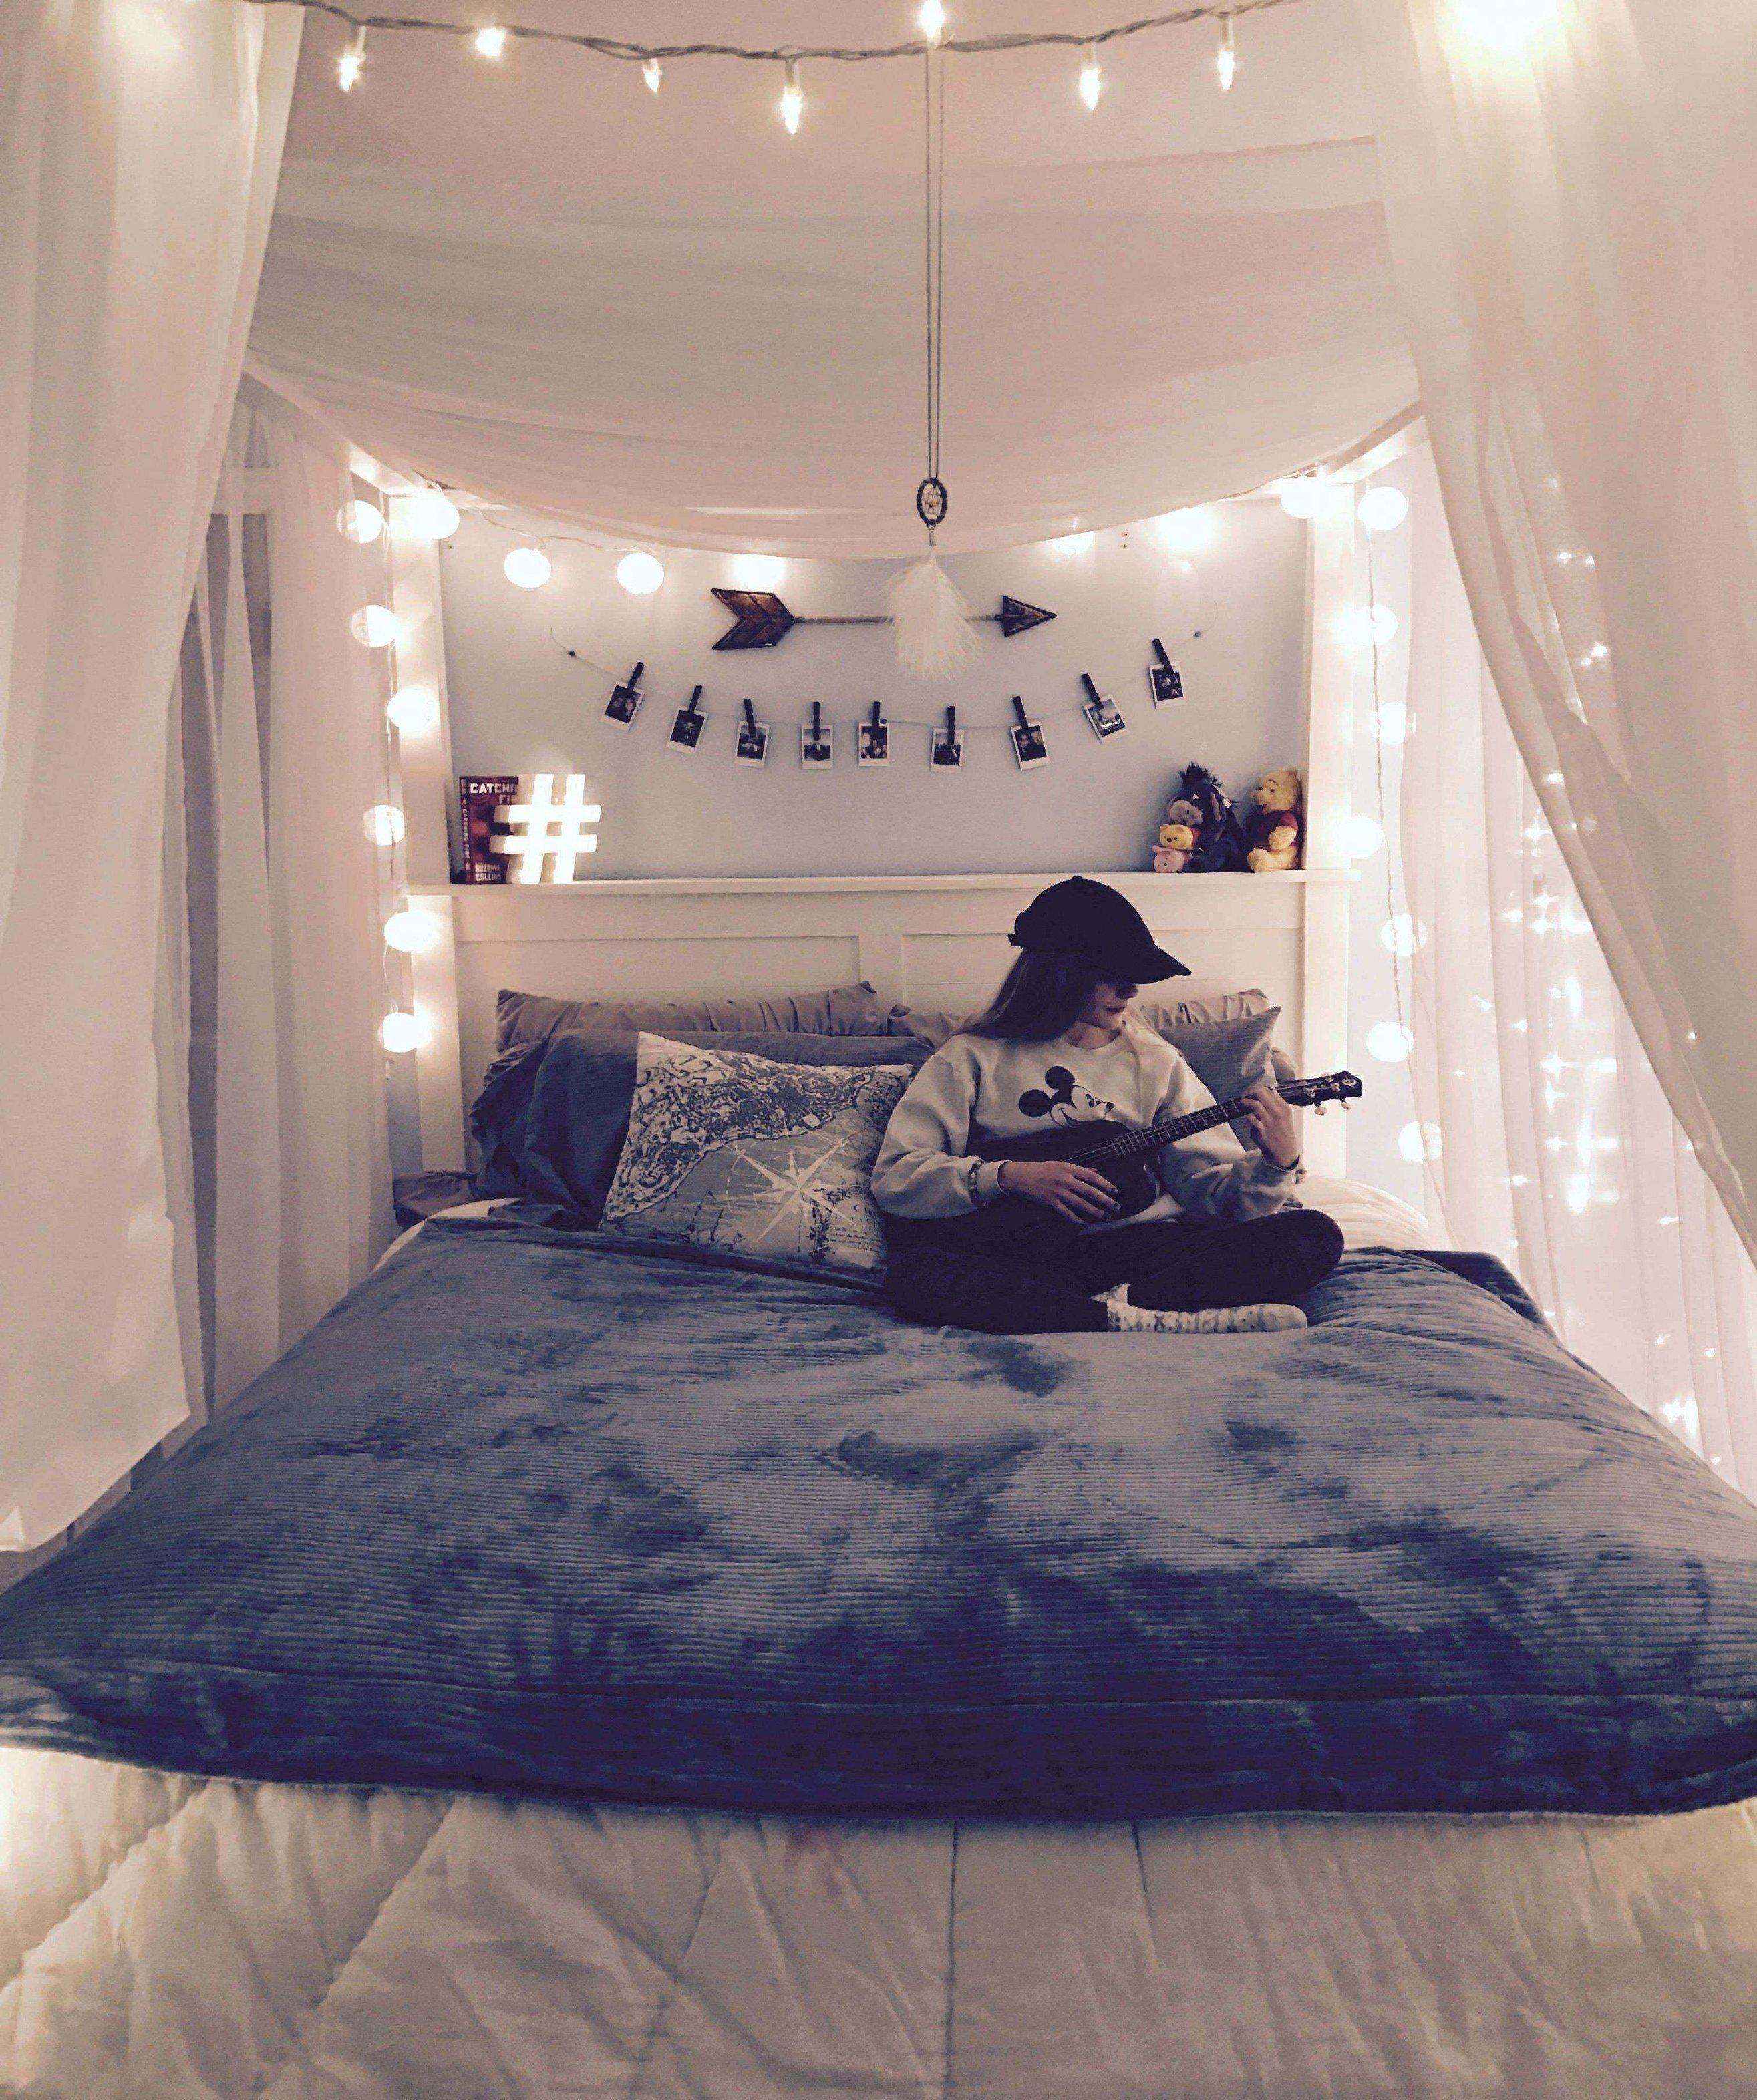 Wall Decoration for Girls Bedroom Elegant Tween Bedroom Ideas Free Download Image Best Girls Room Wall